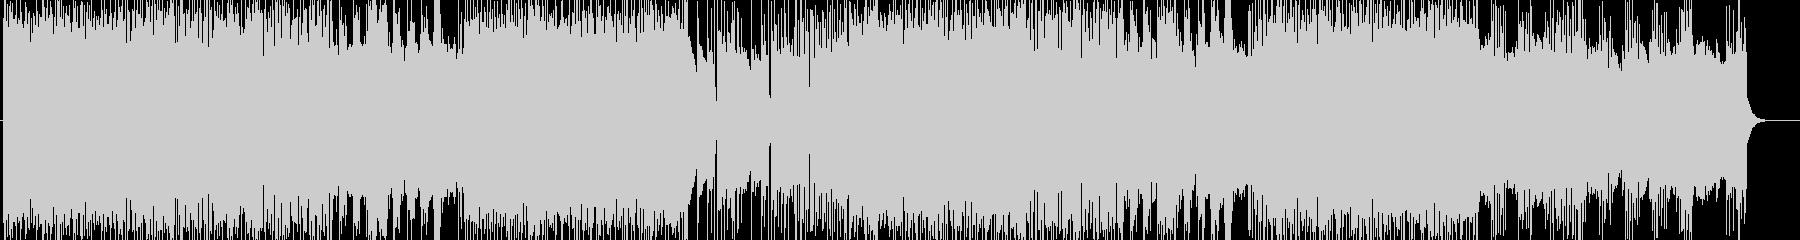 「HR/HM」「DEATH」BGM196の未再生の波形